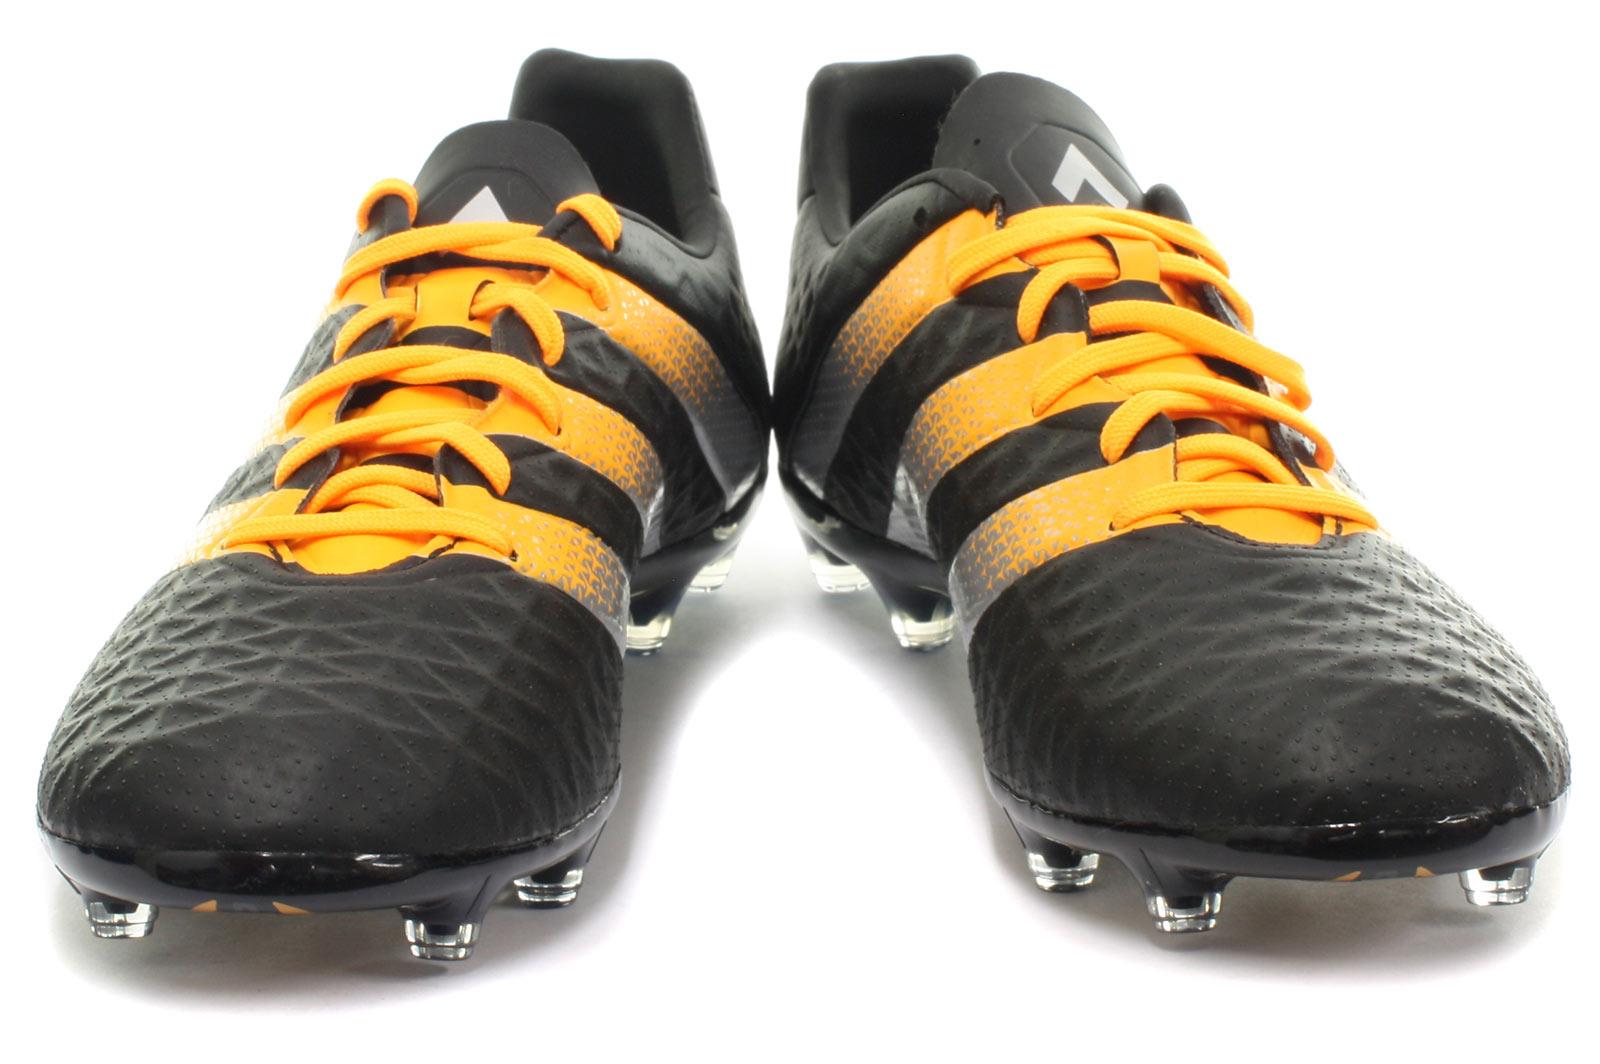 adidas ace 16 ultra stivali scarpe da ginnastica bianca